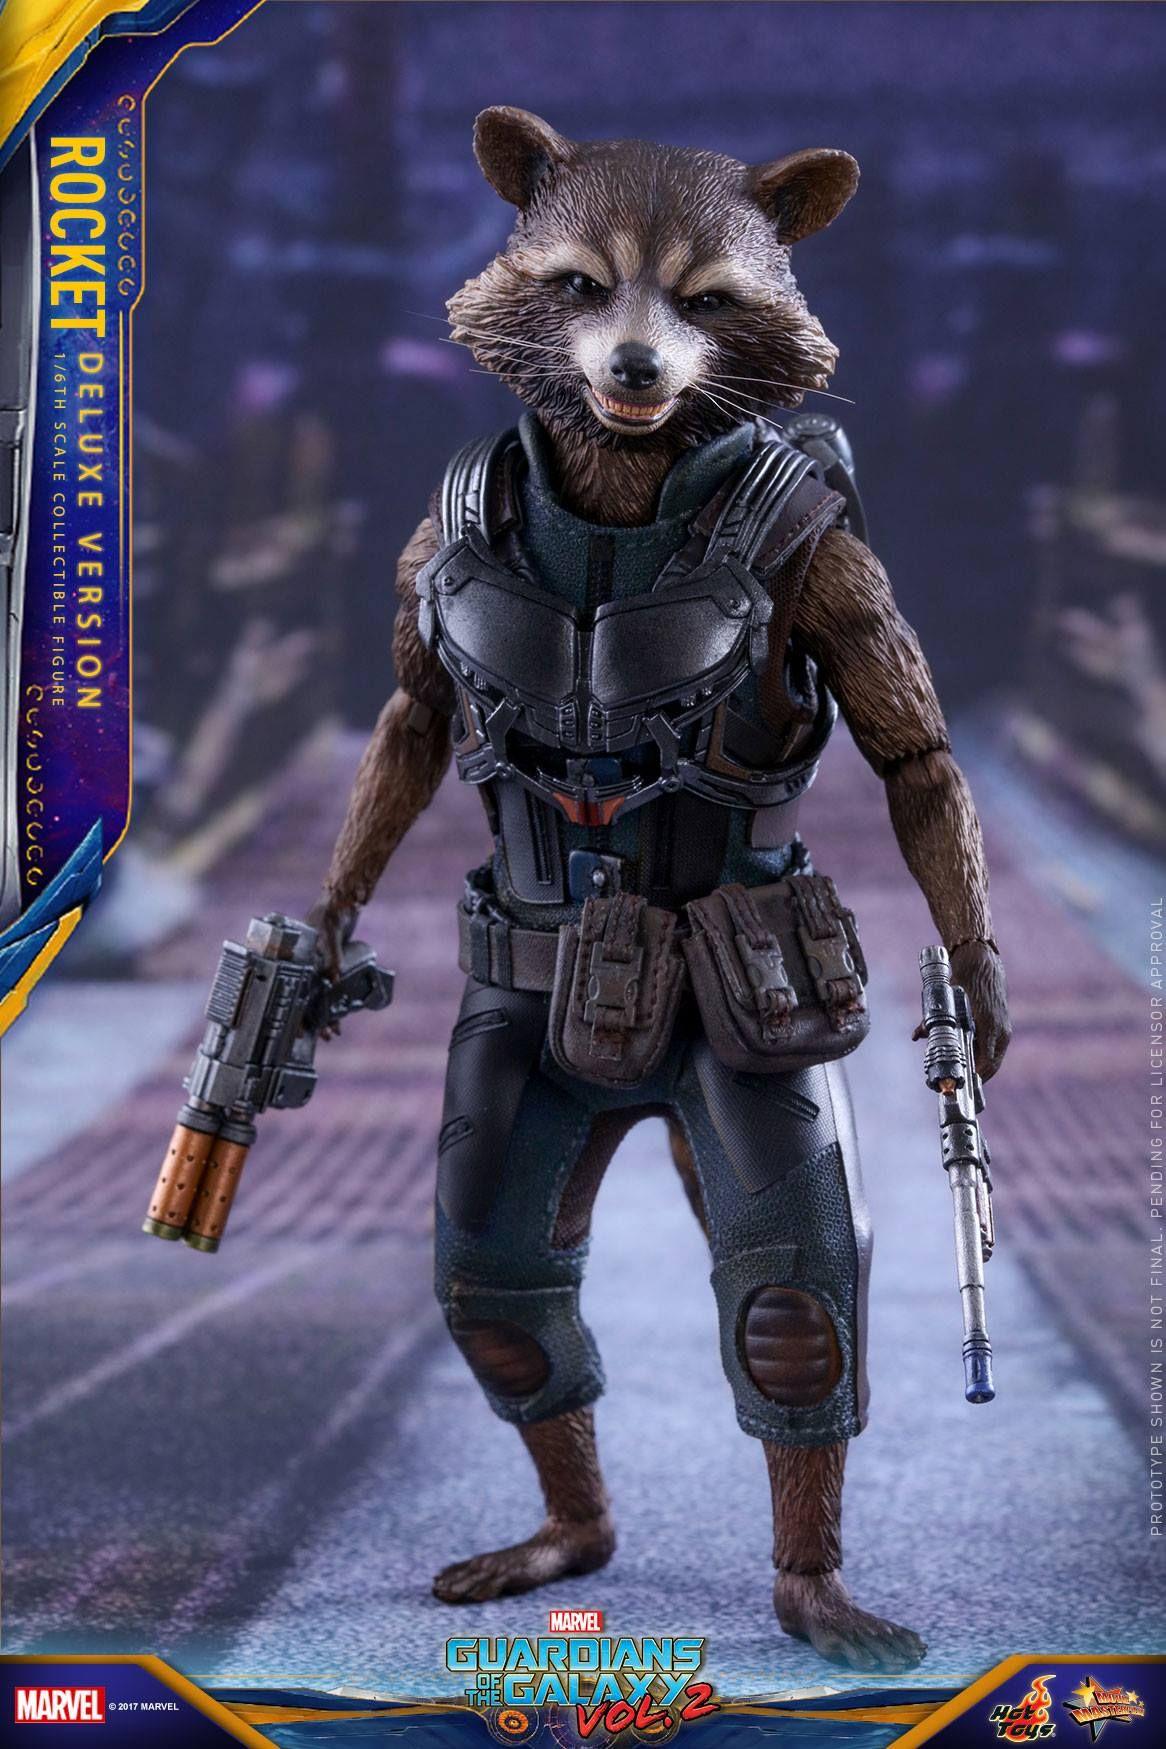 Gotg Vol 2 1 6th Scale Rocket Collectible Figure Deluxe Ver Hot Toys Rocket Raccoon Superhero Wallpaper